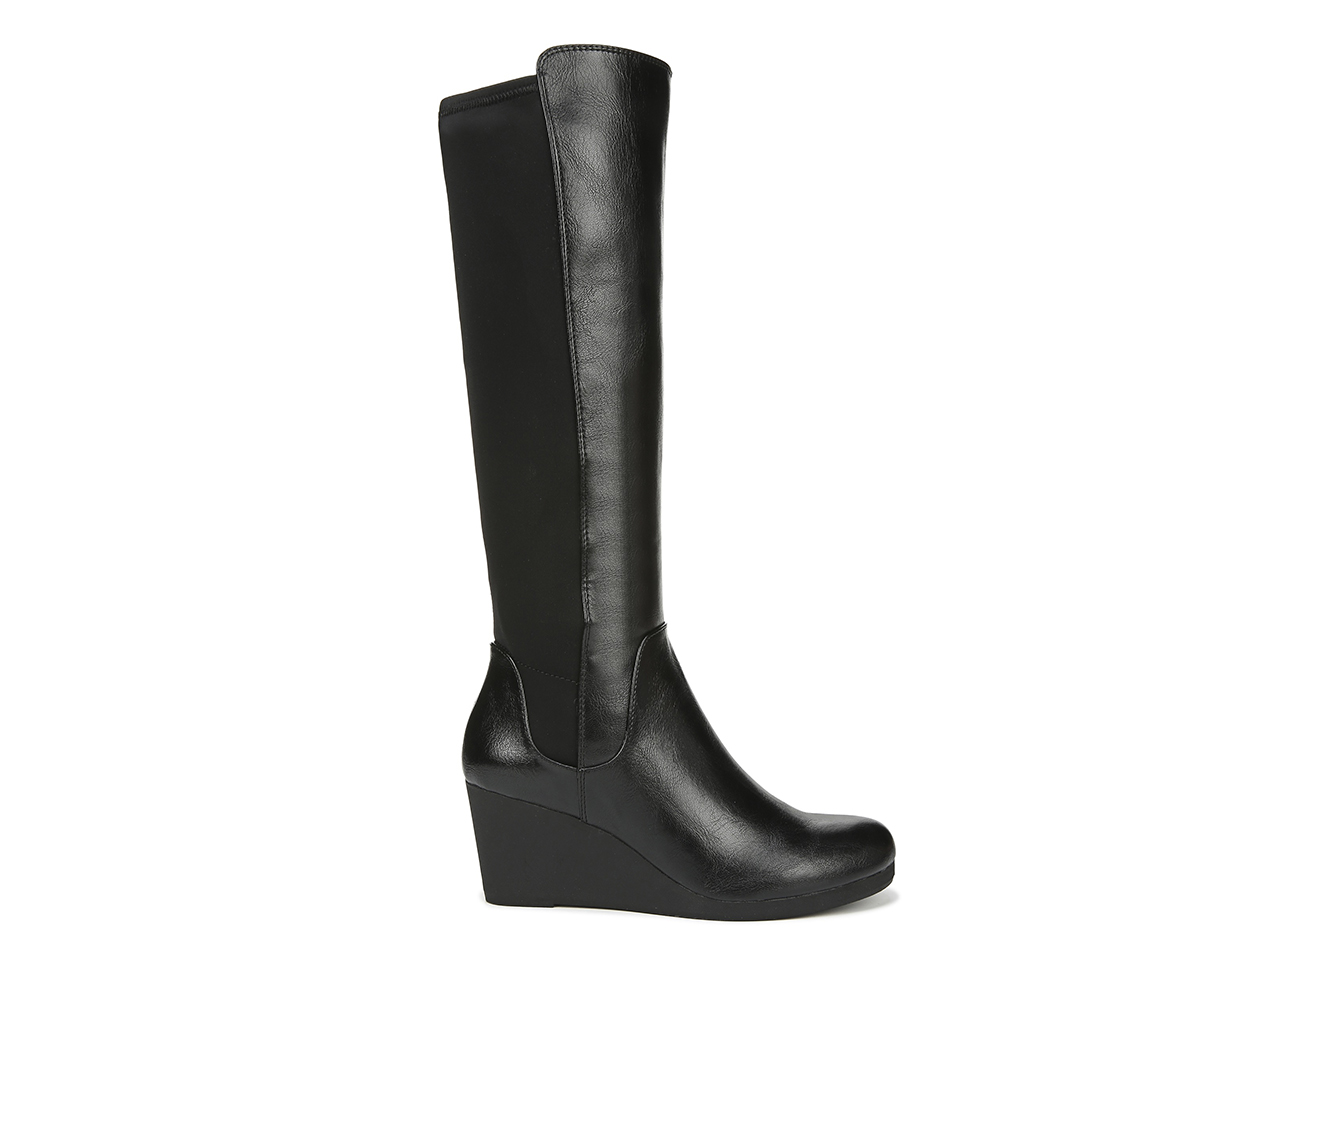 LifeStride Nadra Women's Boots (Black)